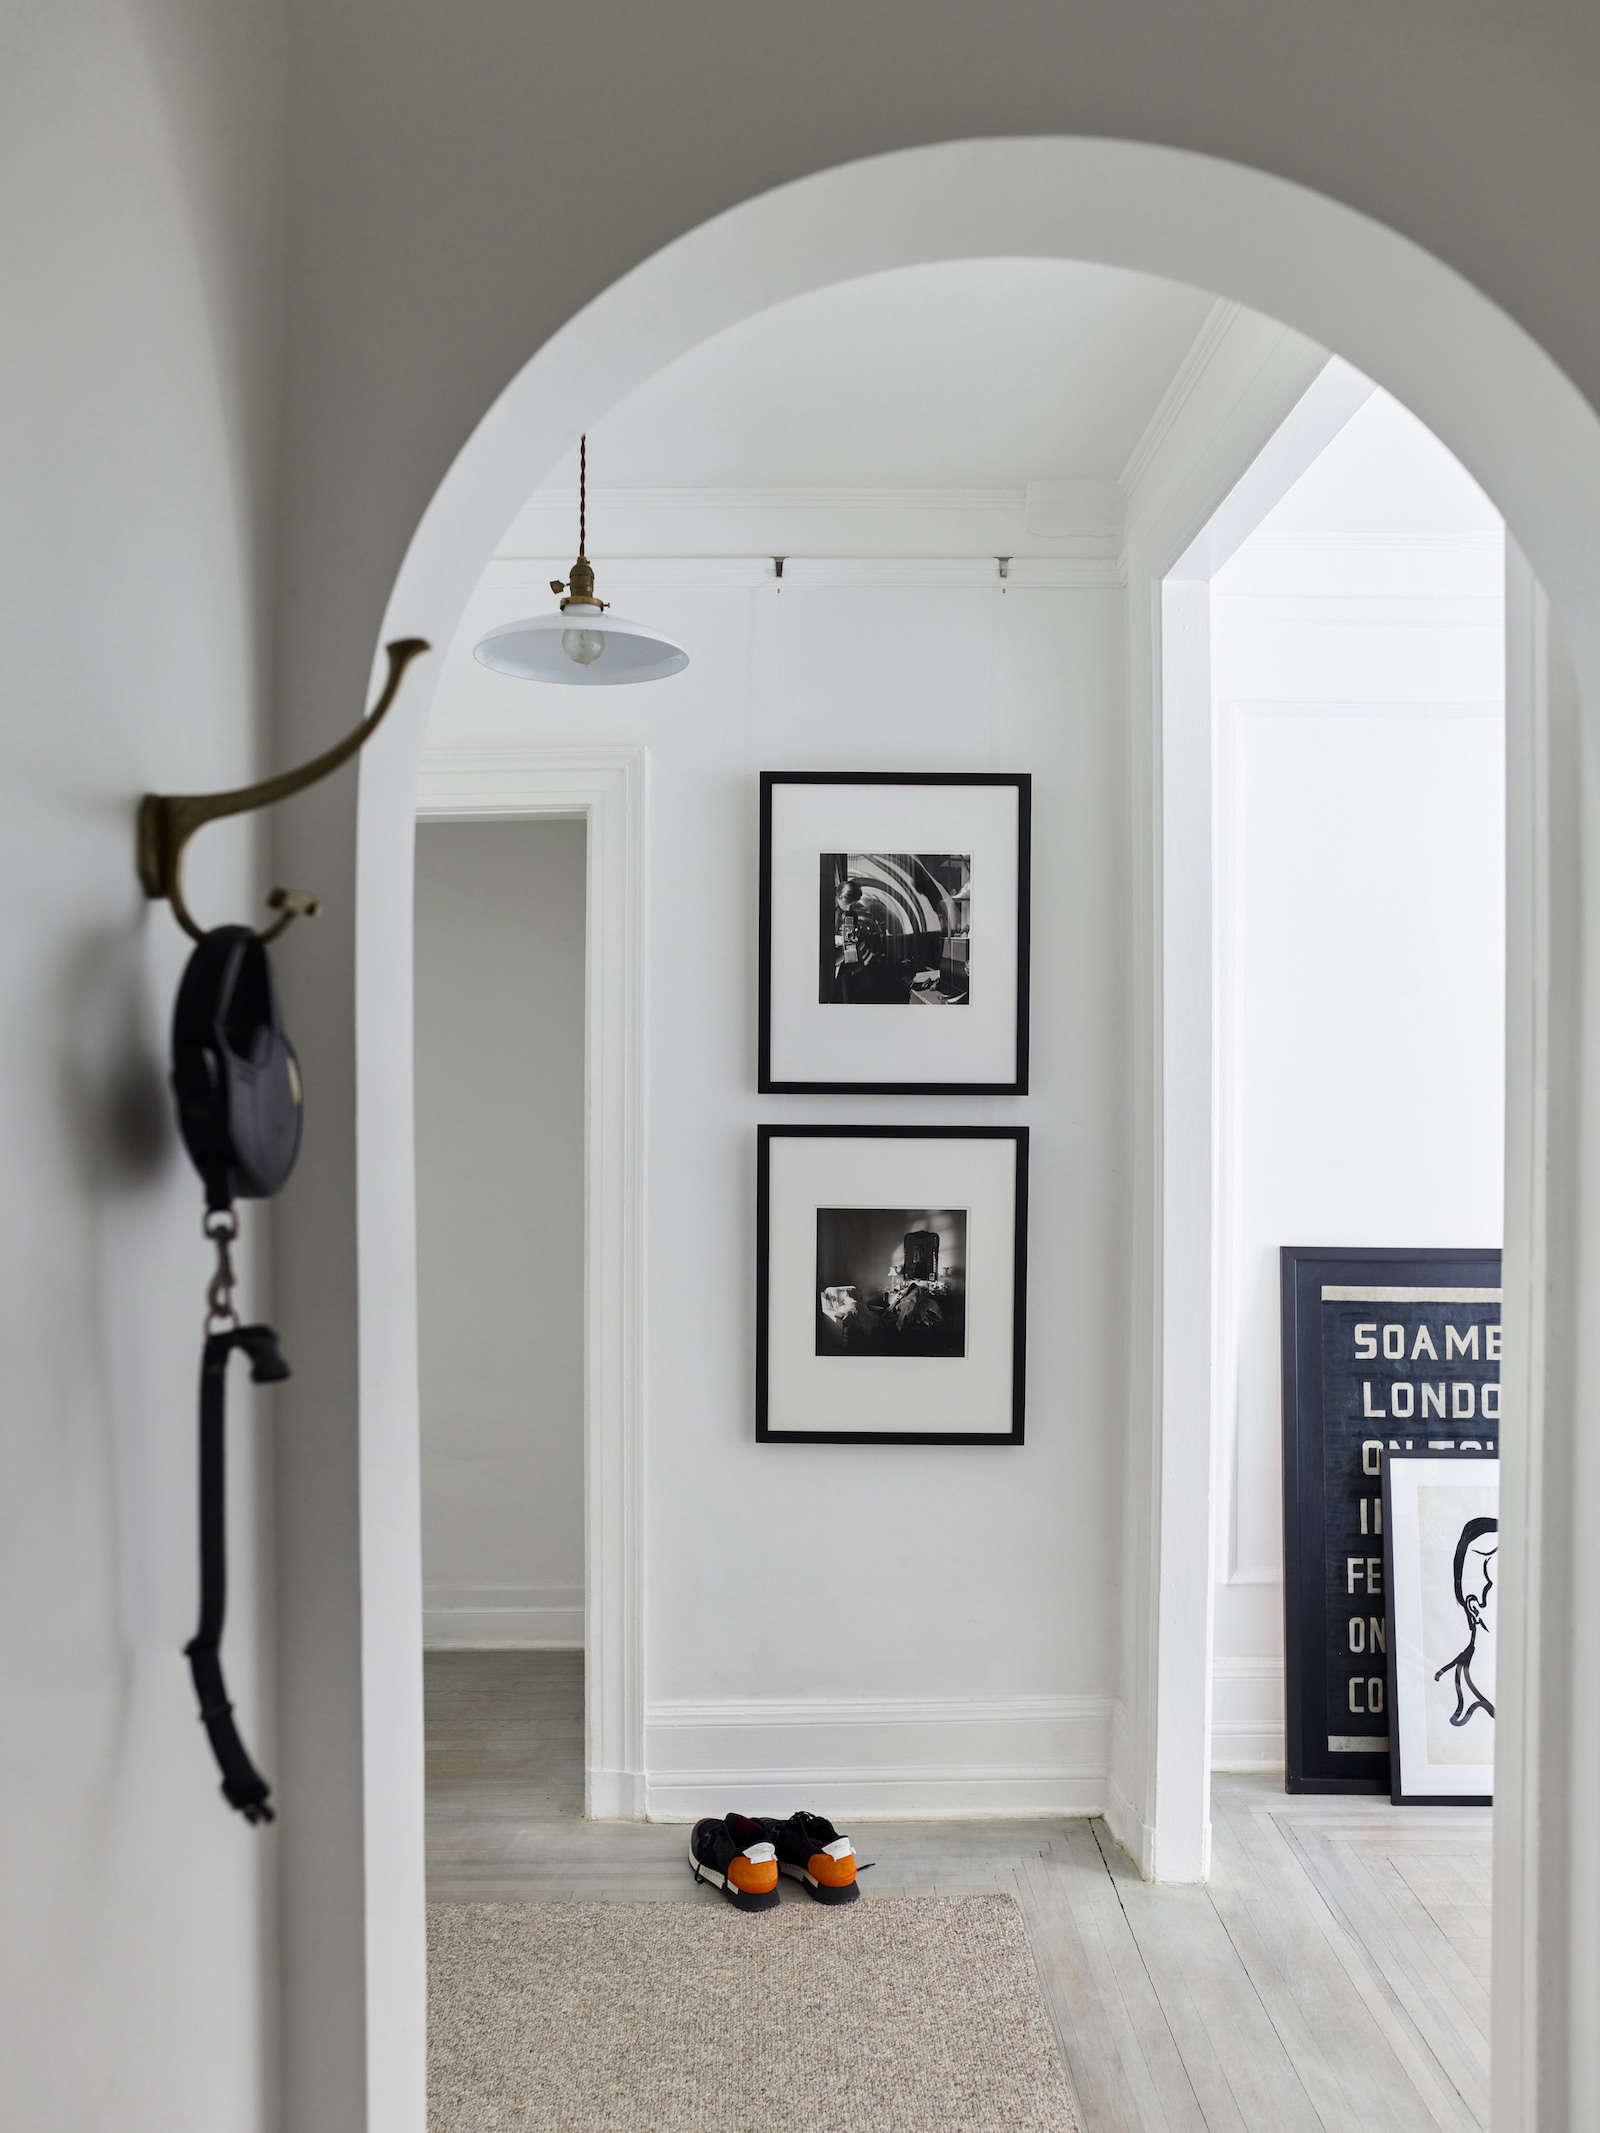 Matthew Axe Jackson Heights Apartment Dog Leash by Eric Piasecki